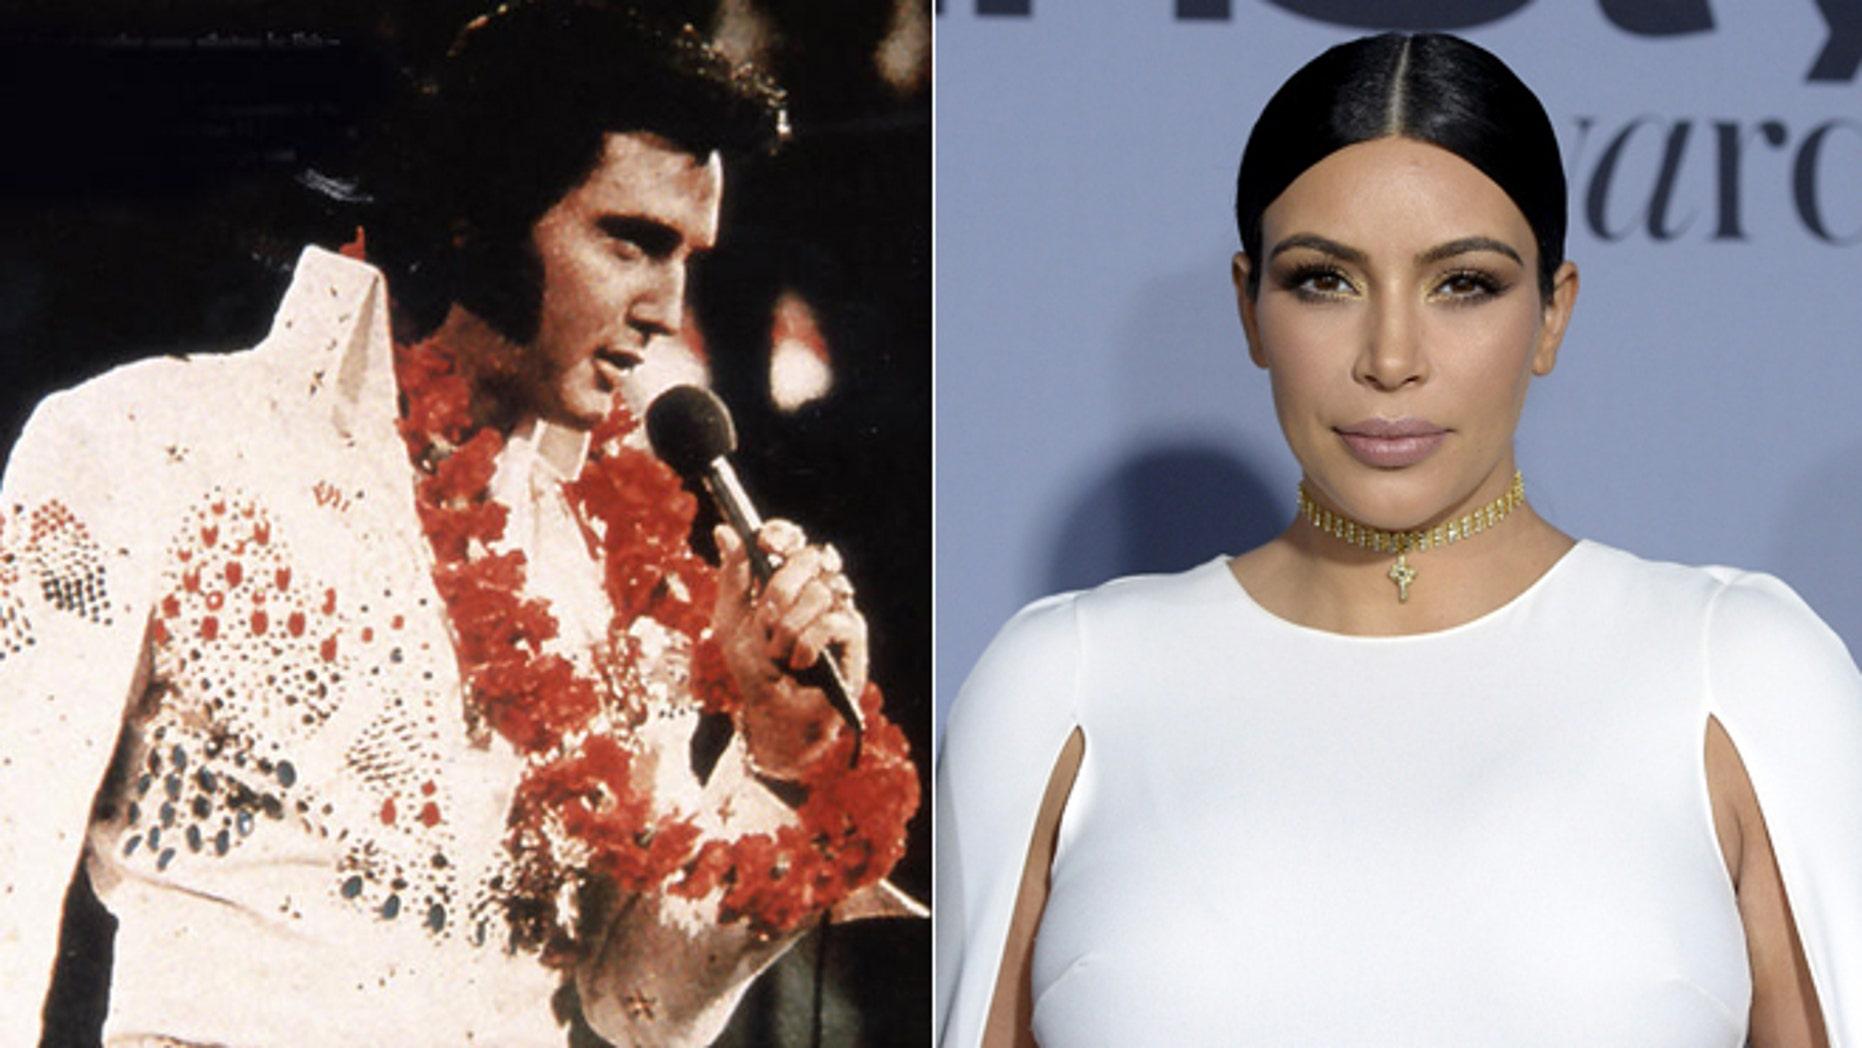 Elvis Presley. Kim Kardashian